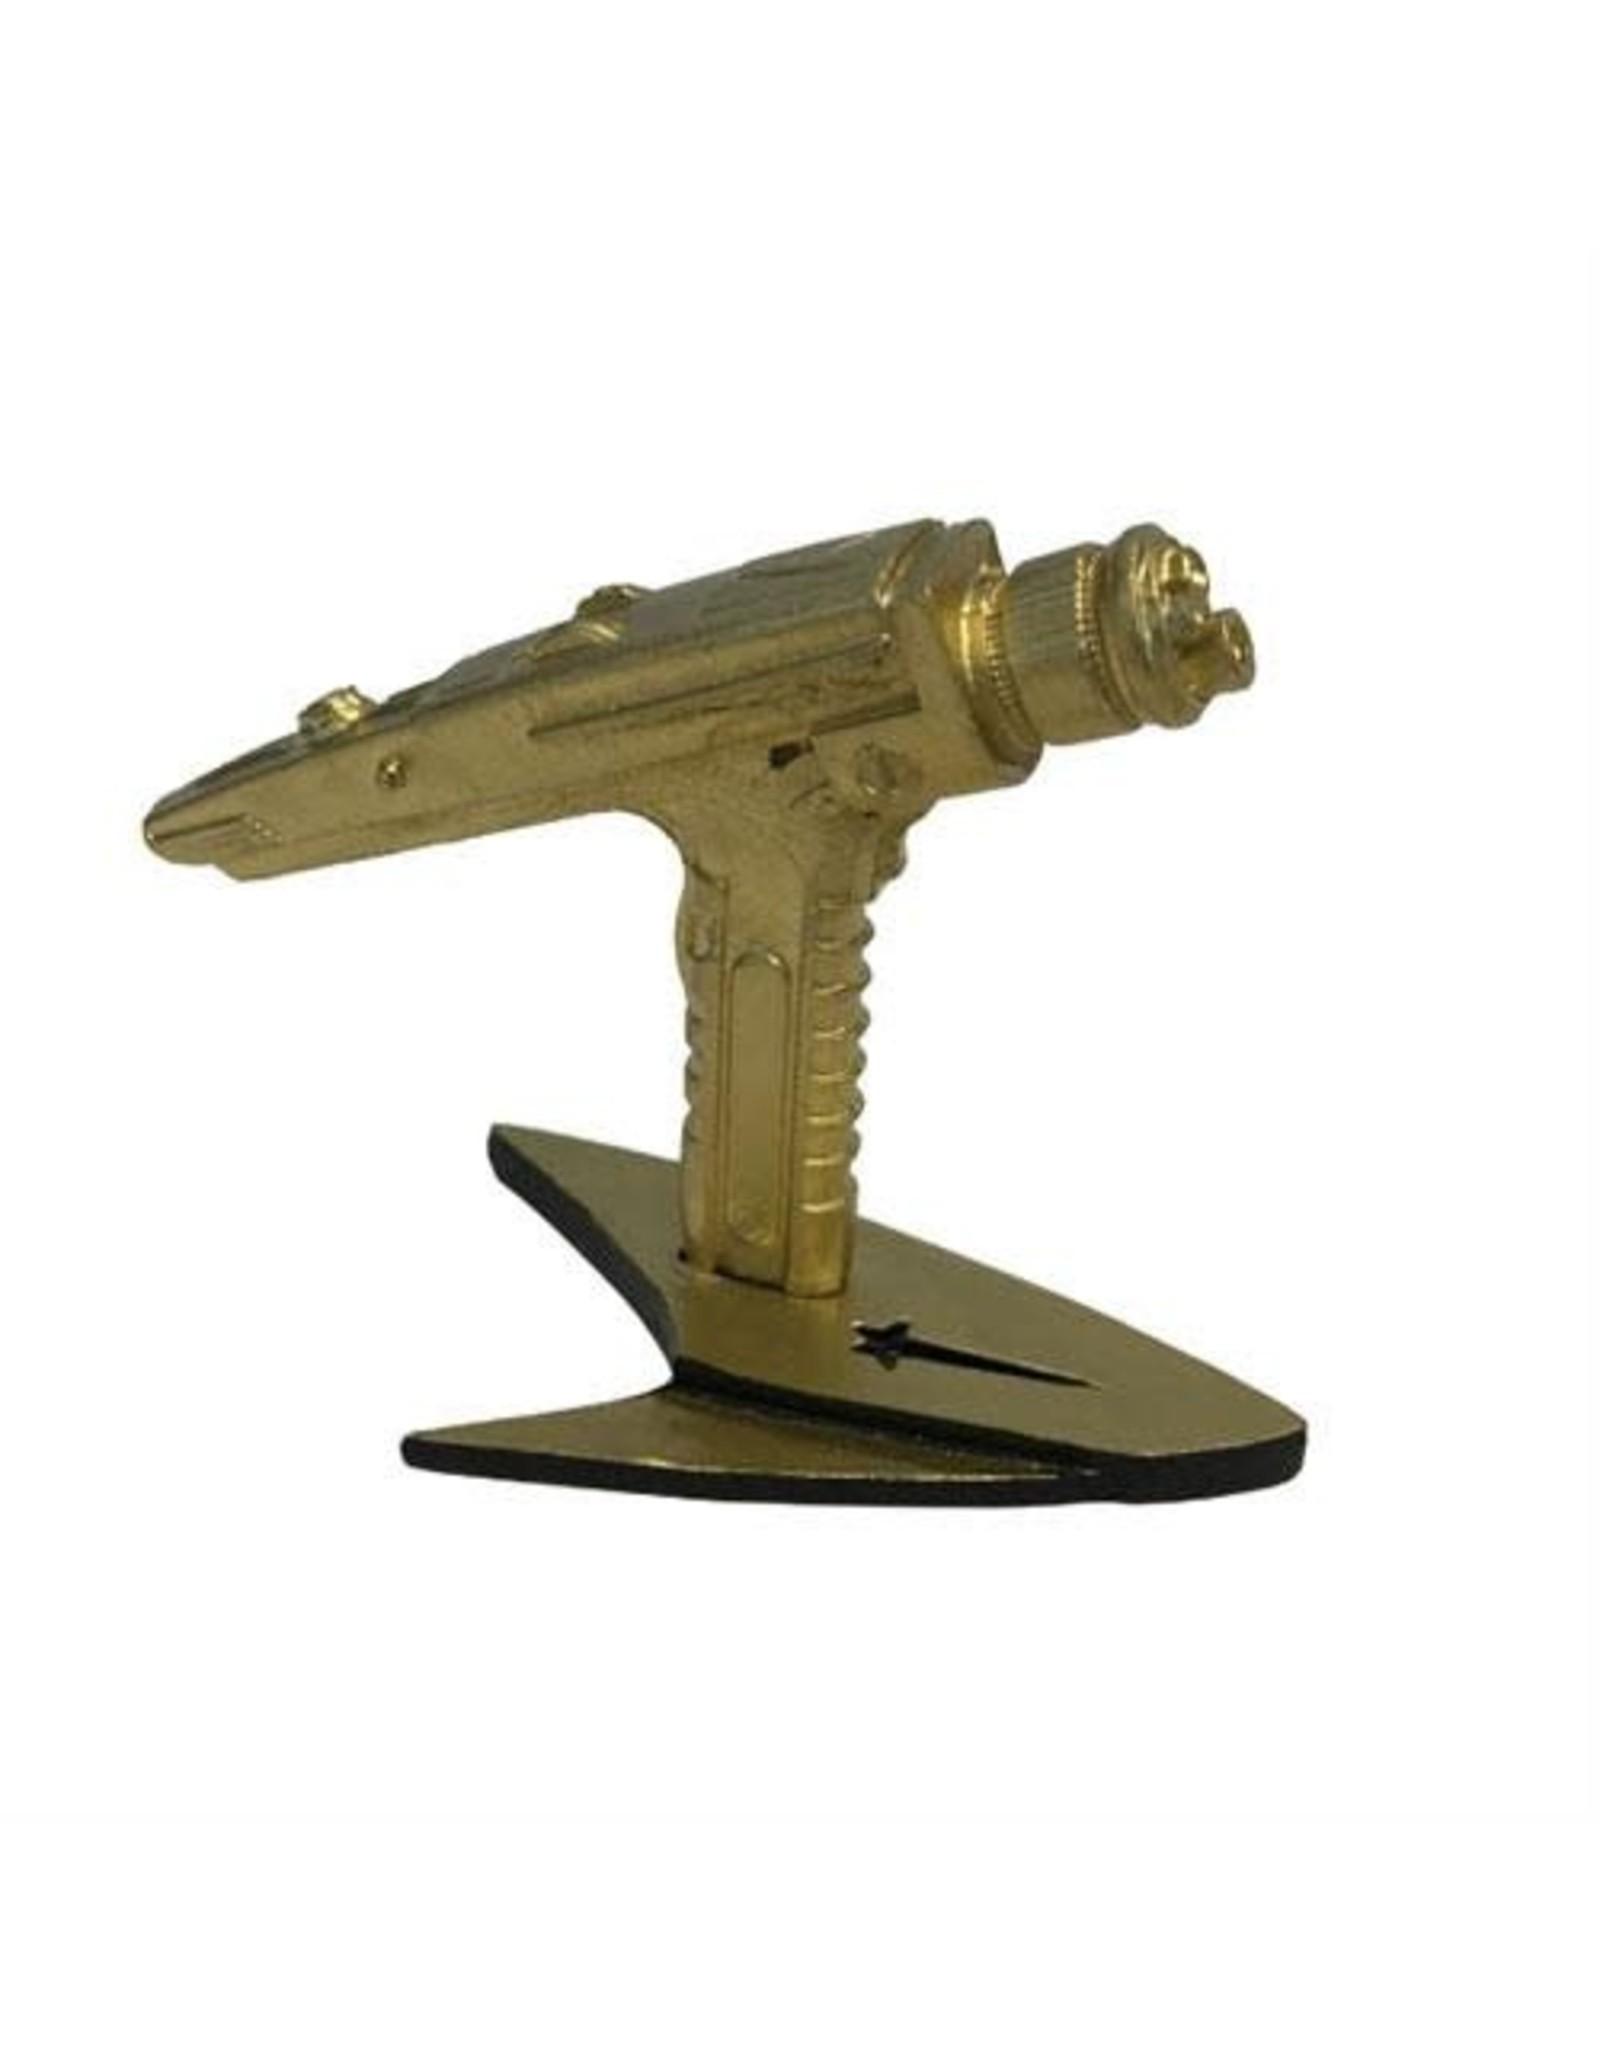 Factory Entertainment STAR TREK Mini Replica 5cm - Starfleet Hand Phaser Gold Variant SDCC 2019